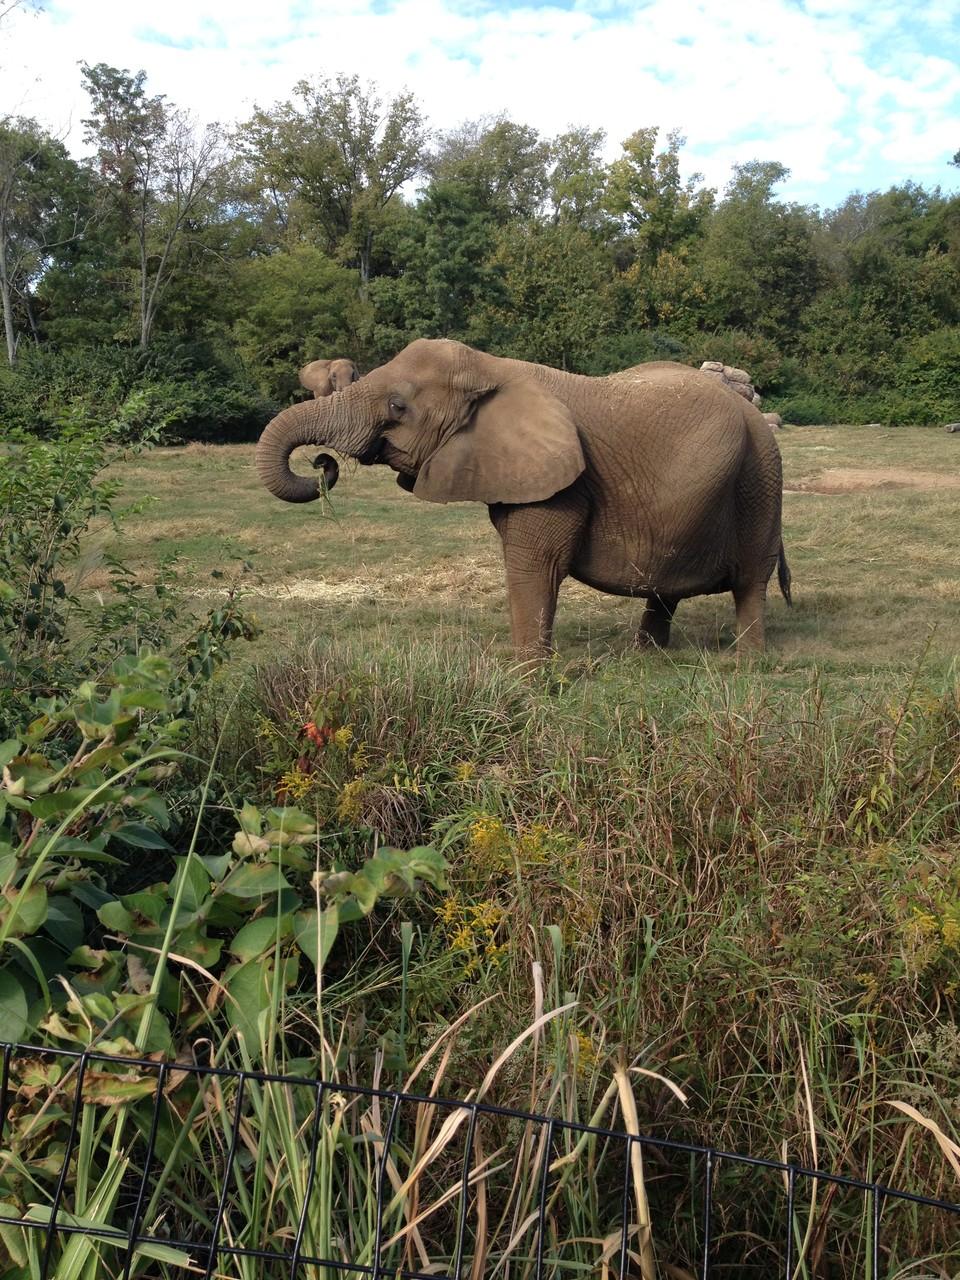 Elefanten sind cool...